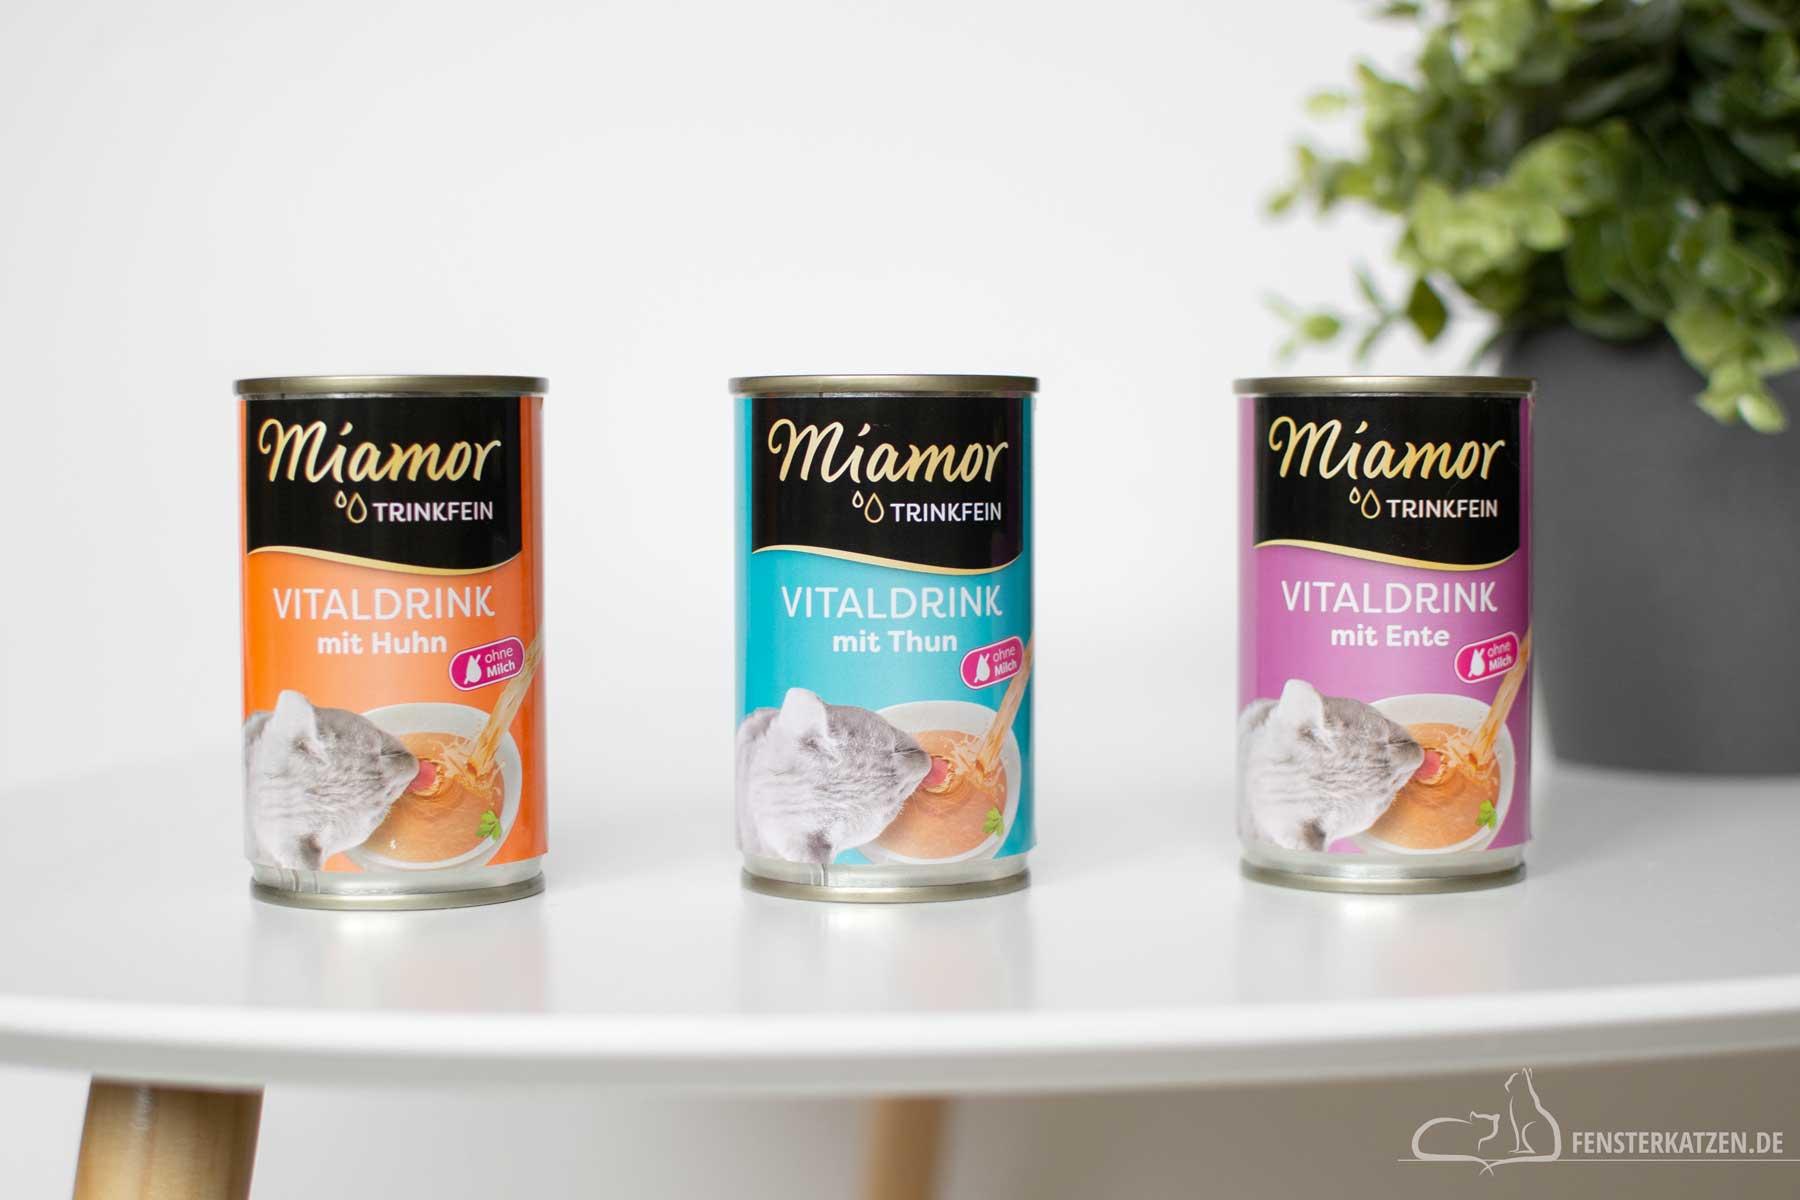 Fensterkatzen-Getestet-Trinkfein-Vitaldrink-Katze-Miamor-Sorten